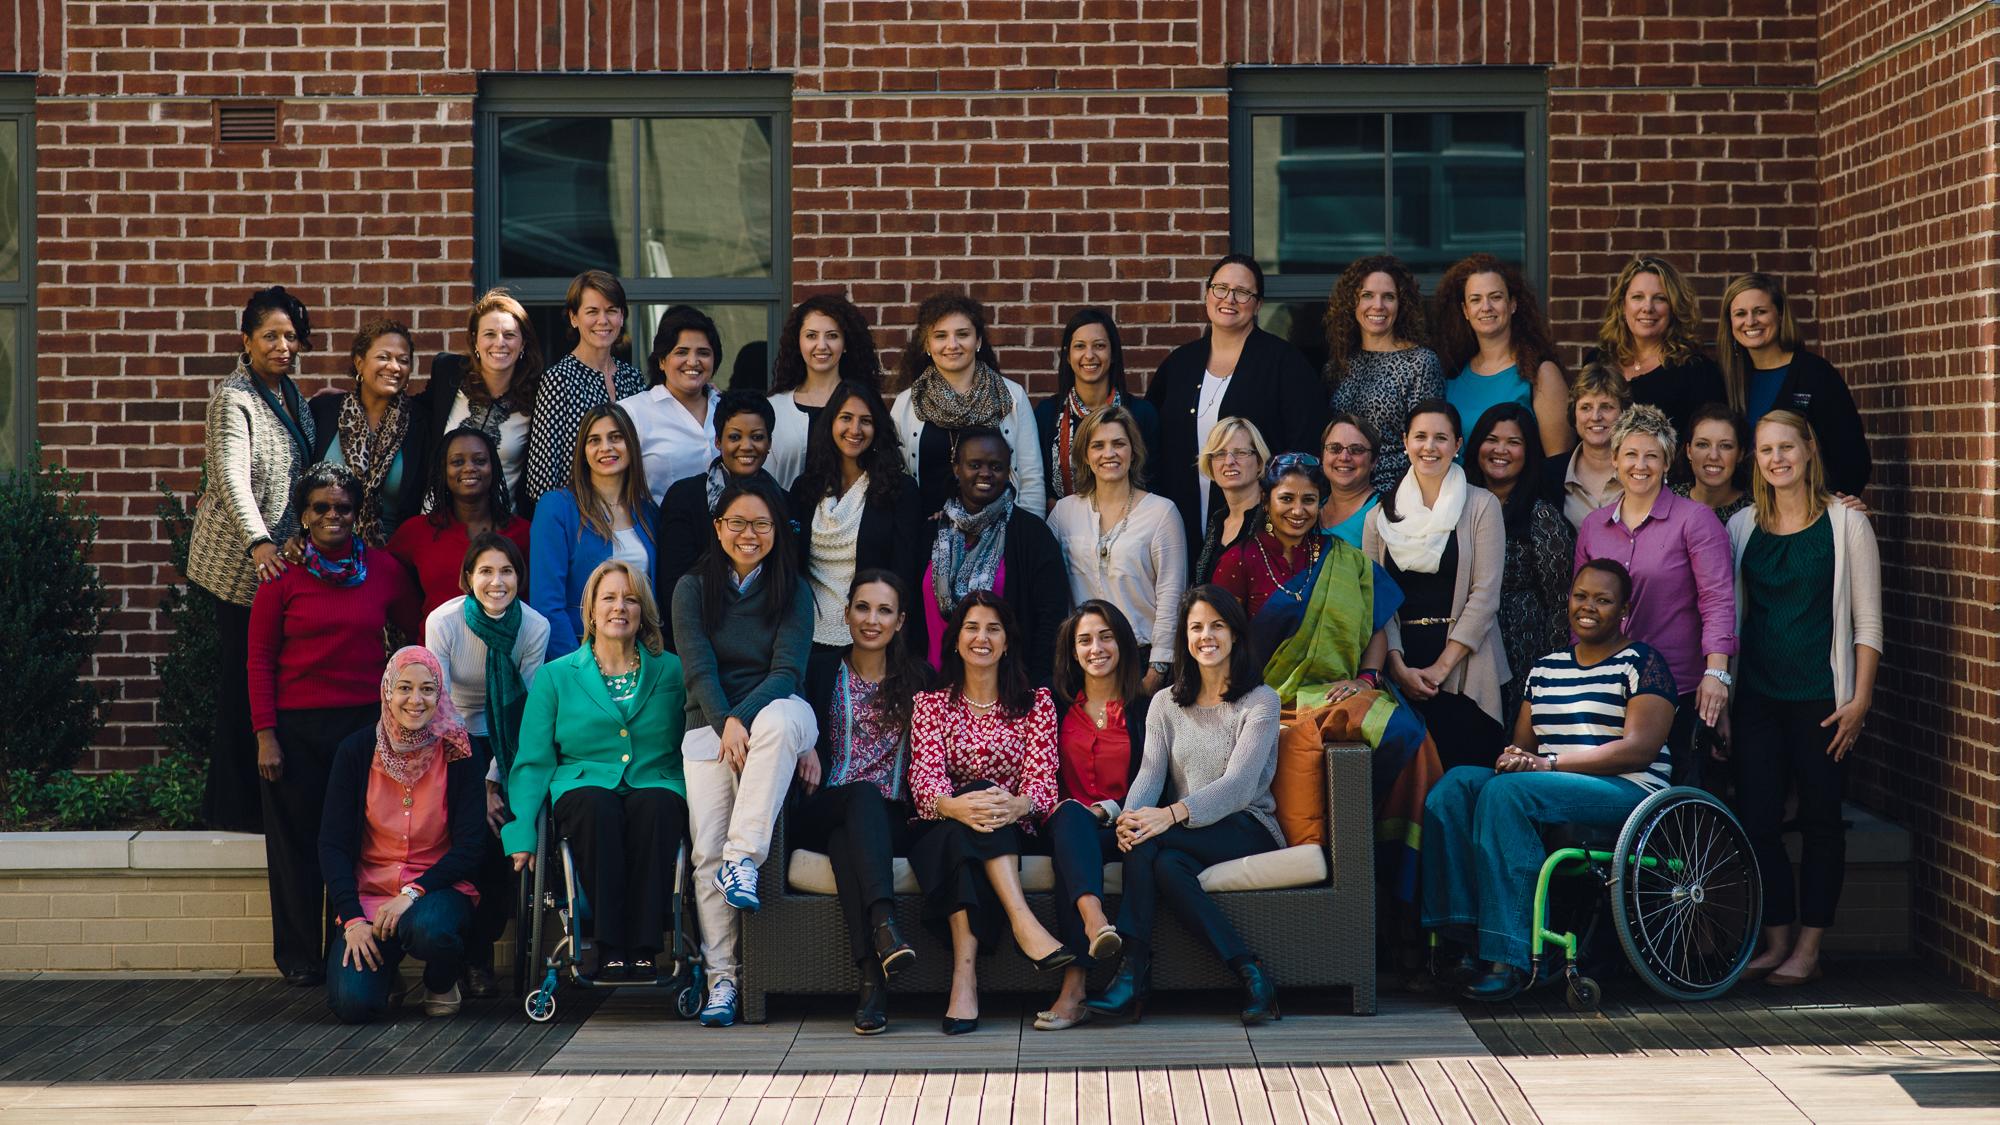 This year's Global Sports Mentoring Program brought women from Armenia, Azerbaijan, Bangladesh, Brazil, Denmark, Egypt, Haiti,   Jordan, Kenya, Lebanon, Ukraine, Pakistan, Singapore, Turkey, and Zimbabwe.